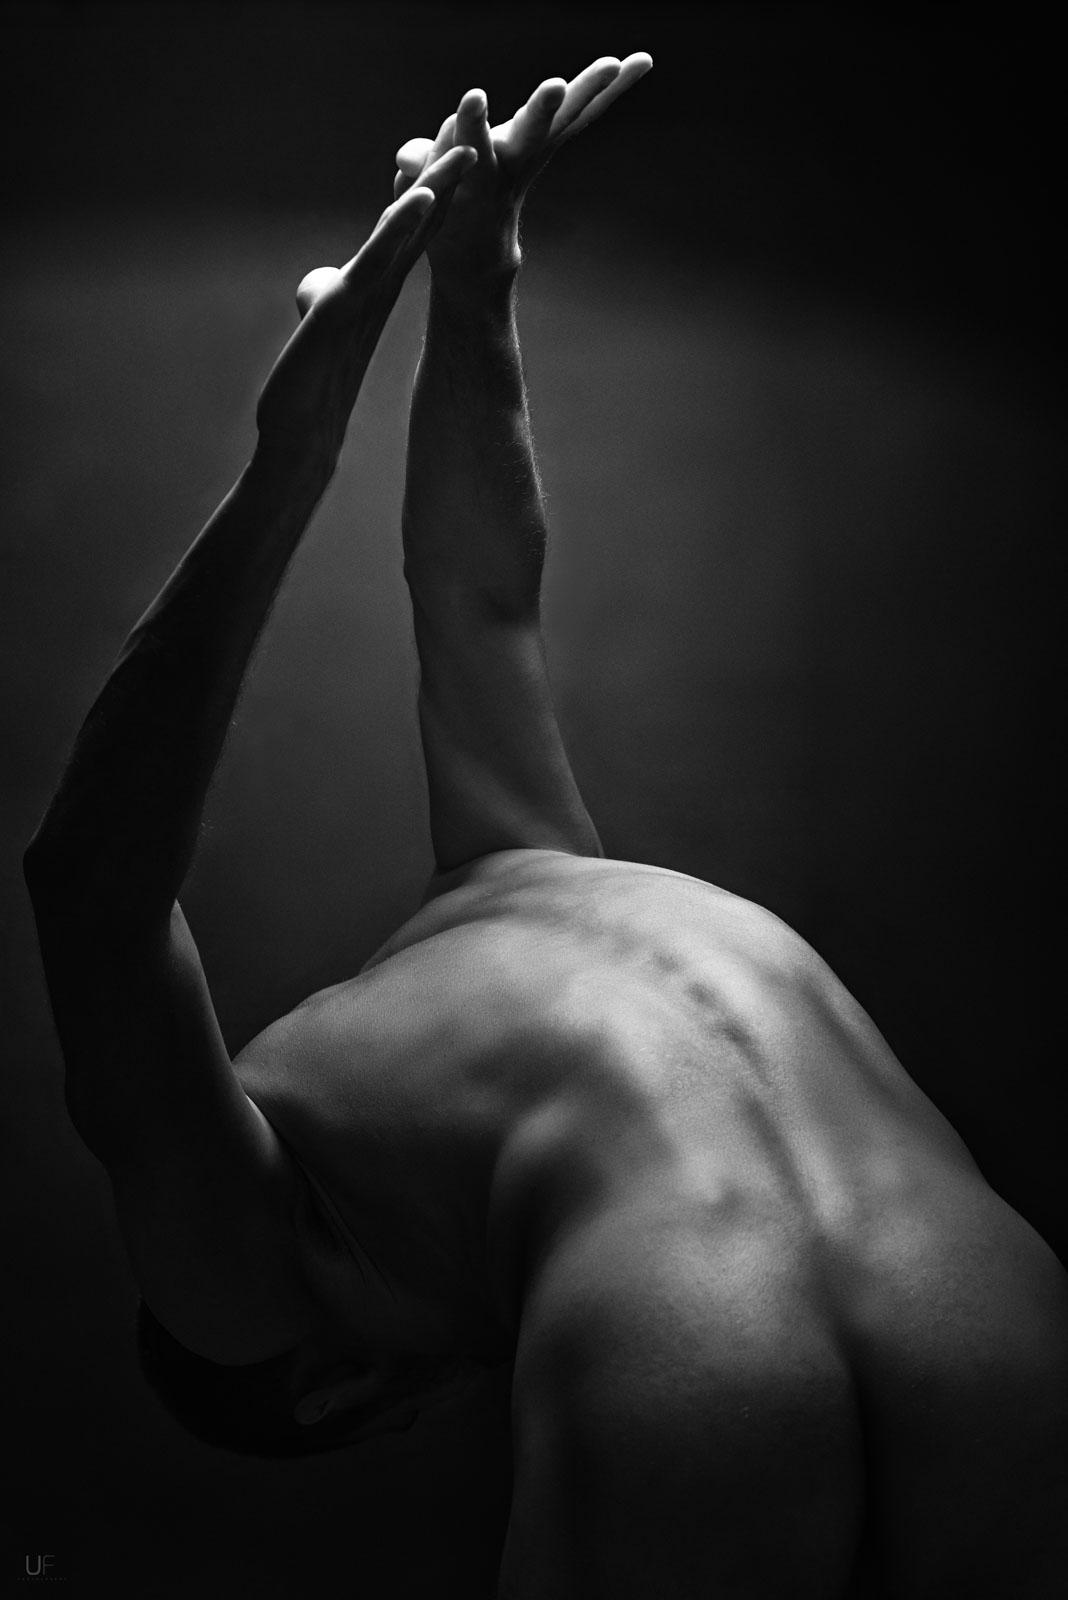 Umbertofederico Photography - Portfolio Akt